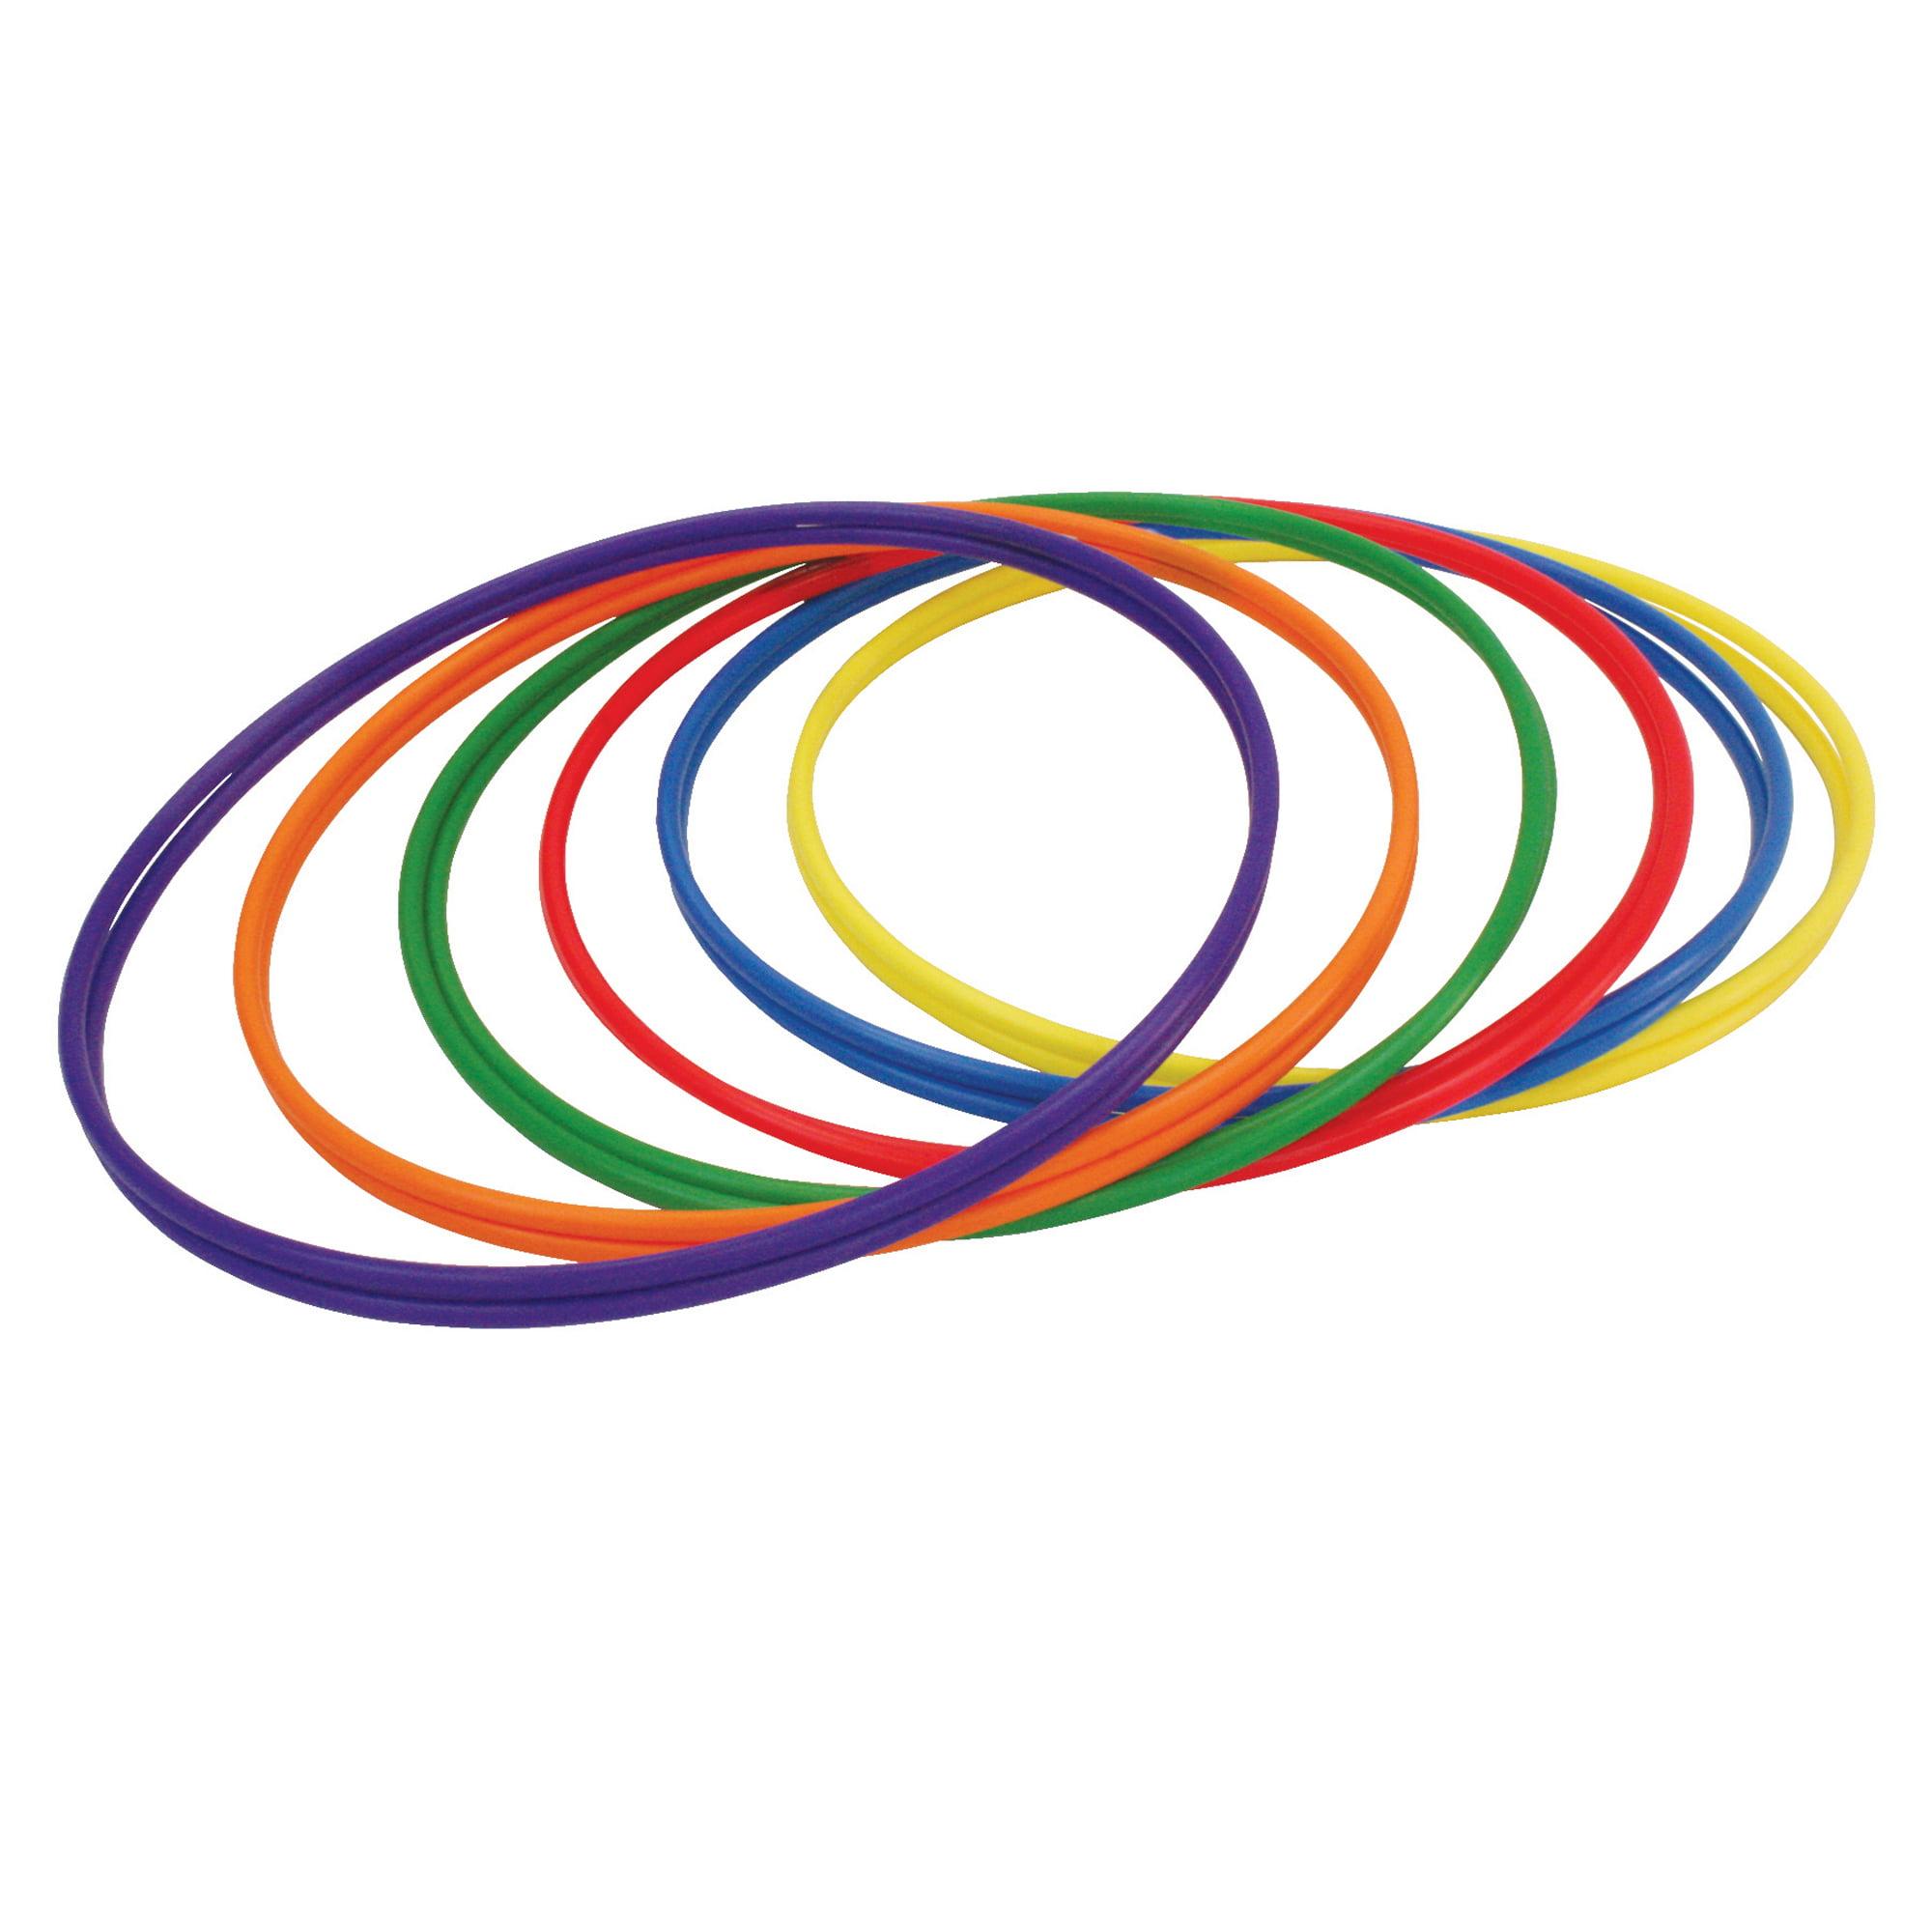 "Plastic Hula Hoops, 30"", Pack of 12"